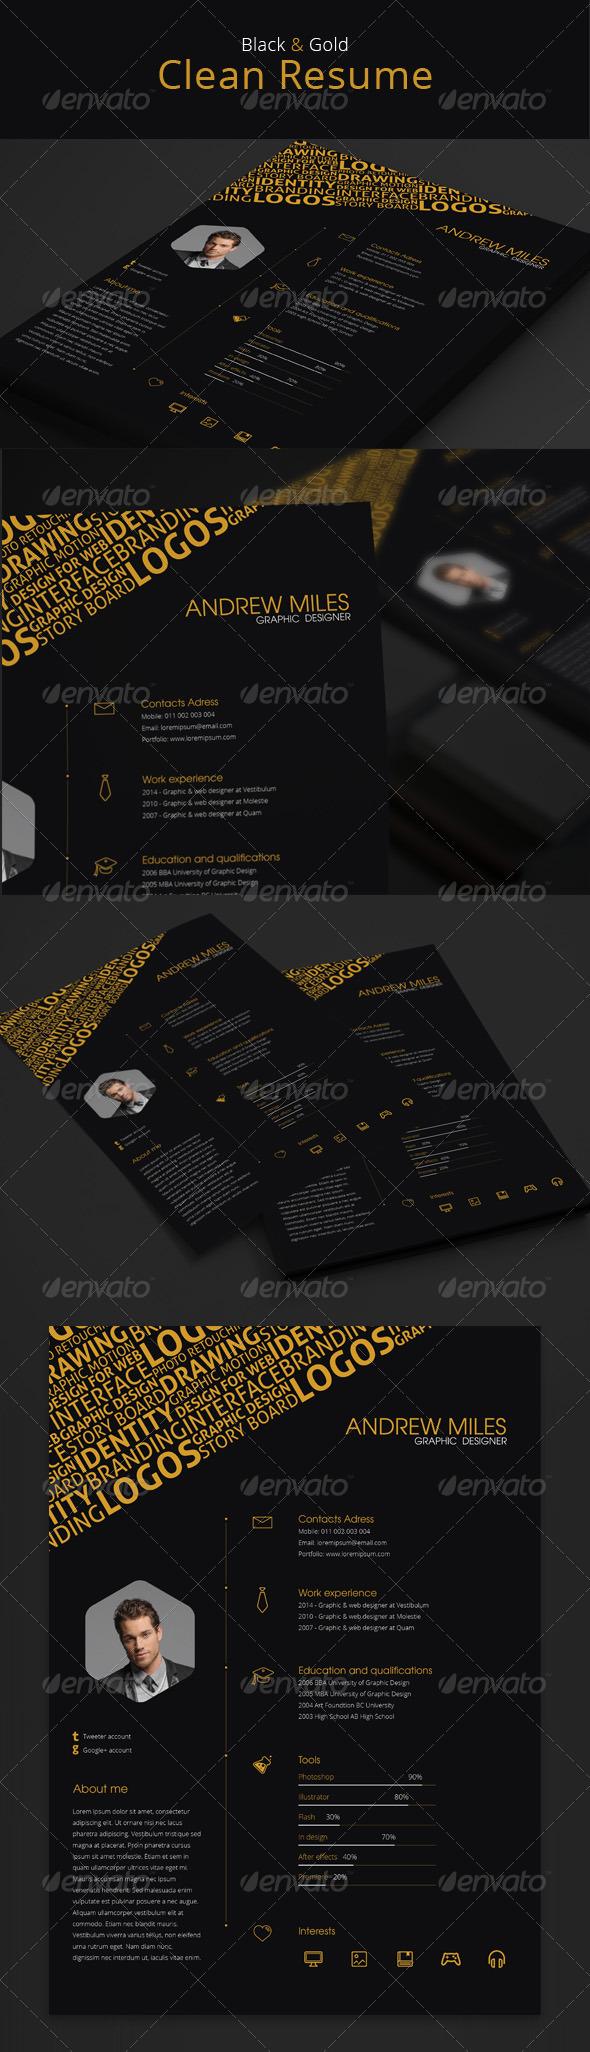 black & gold resume